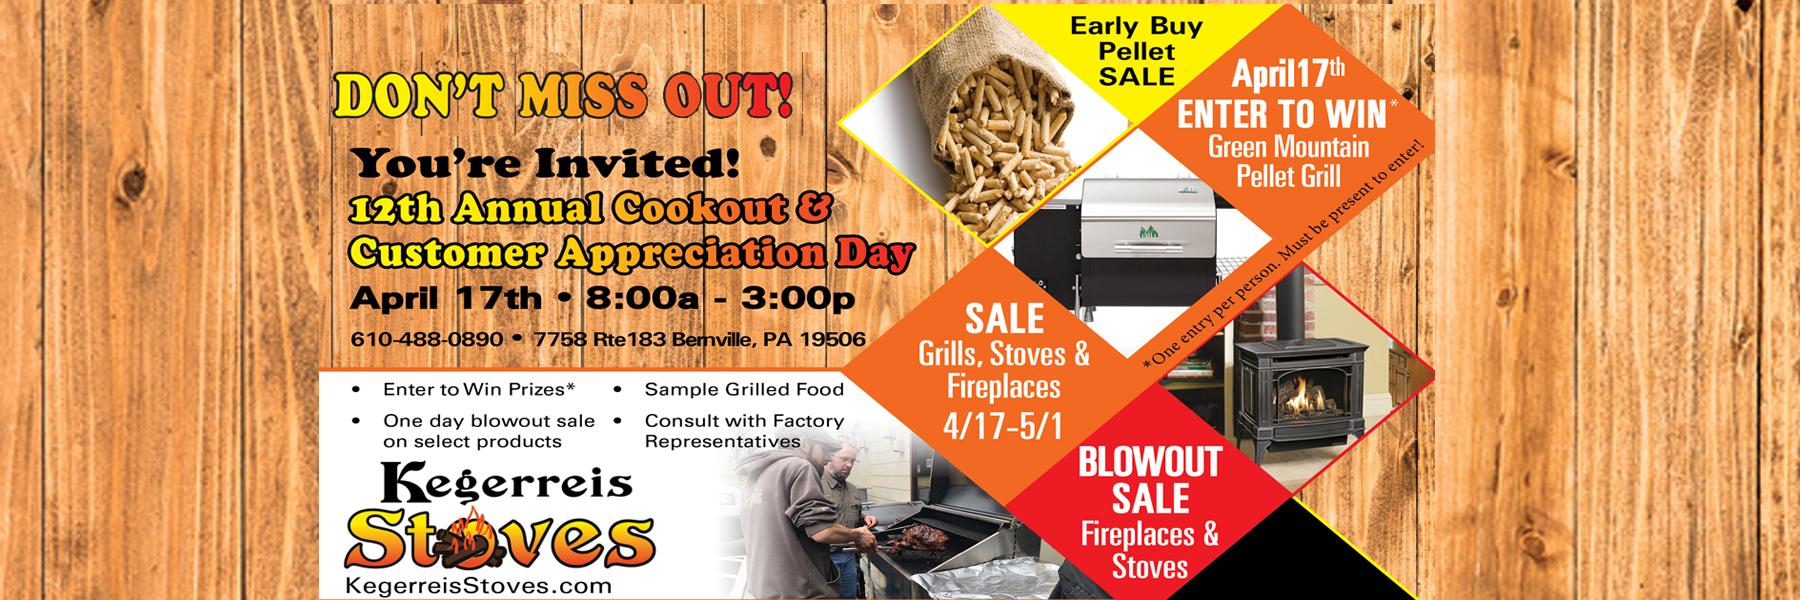 Kegerreis Stoves Customer Appreciation Sale April 17, 2021